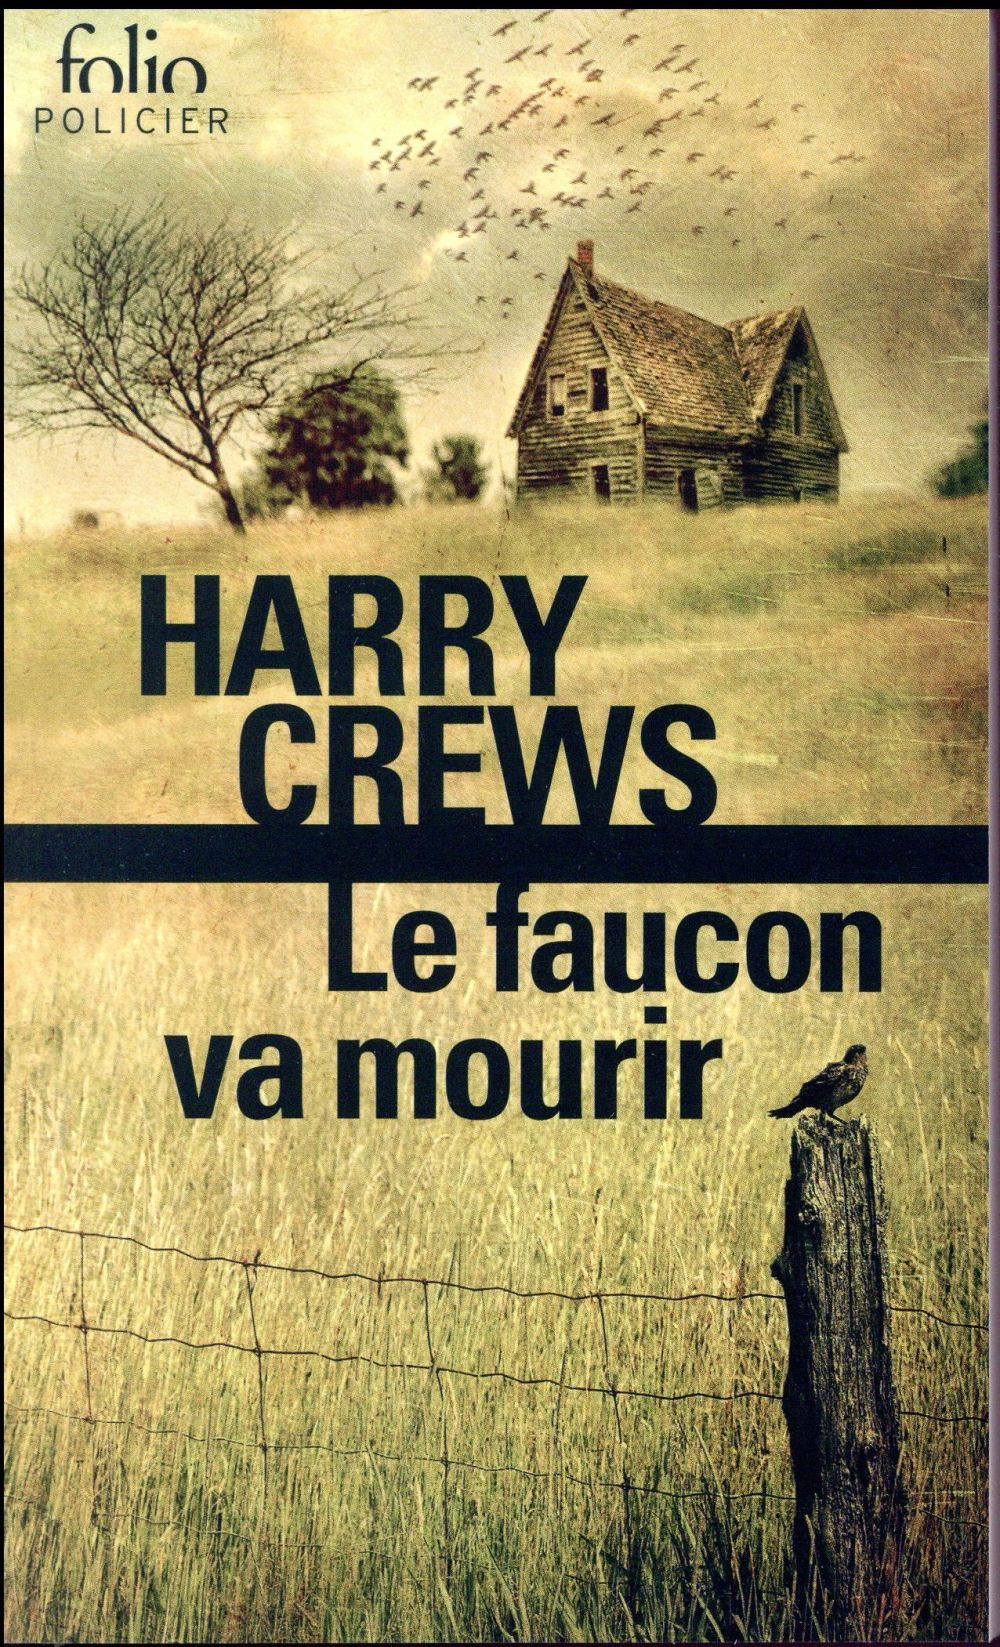 LE FAUCON VA MOURIR